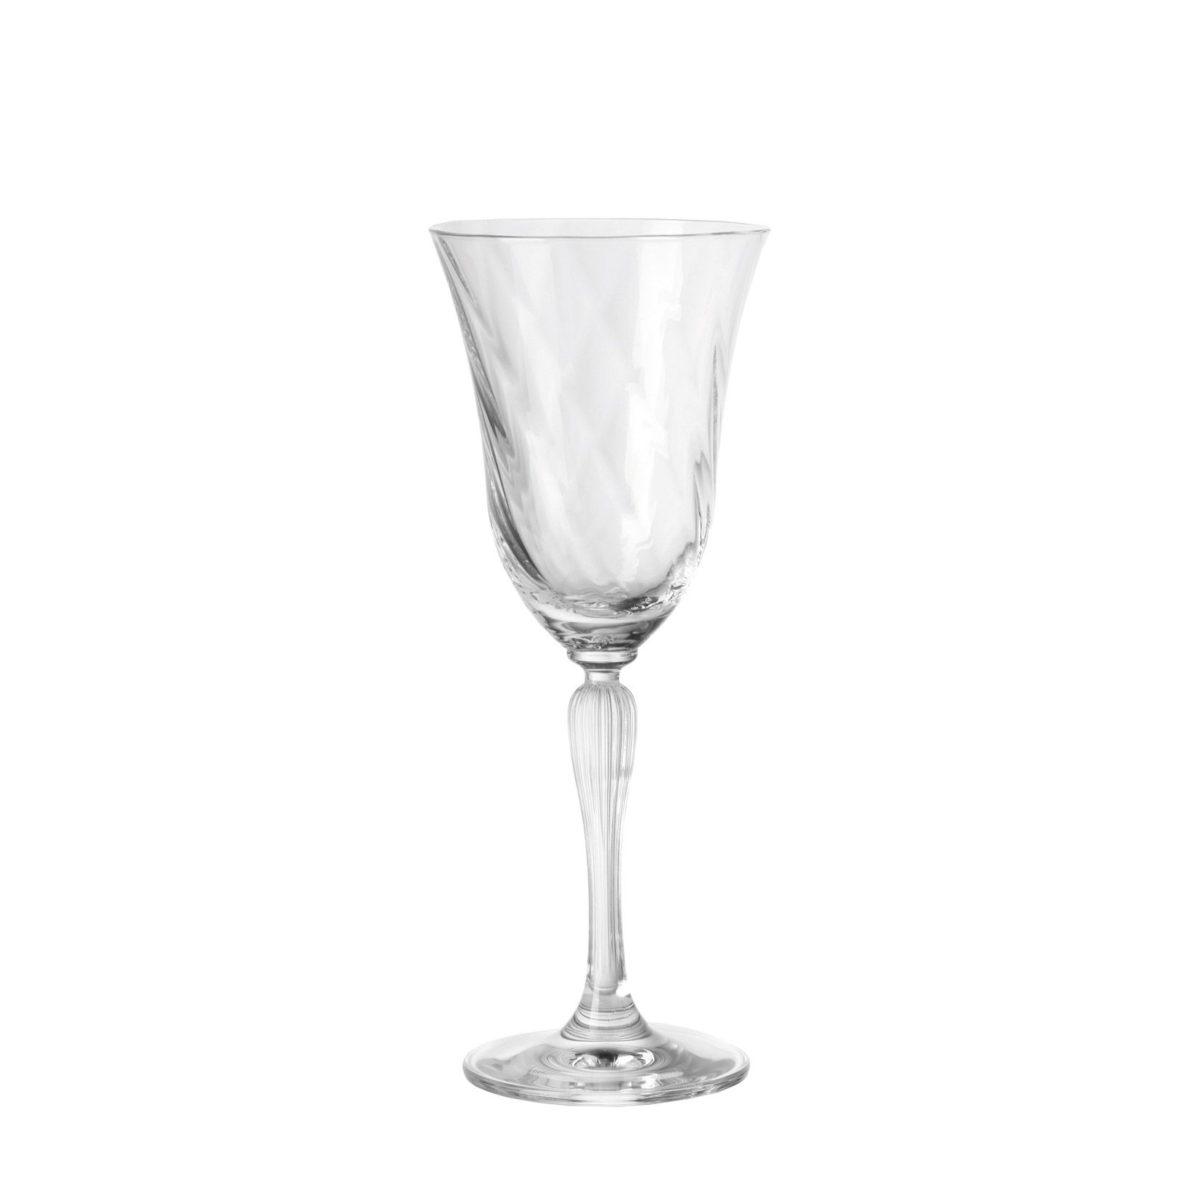 020764 0 k 1200x1200 - Pahar pentru vin alb Volterra 200 ml (L020764)